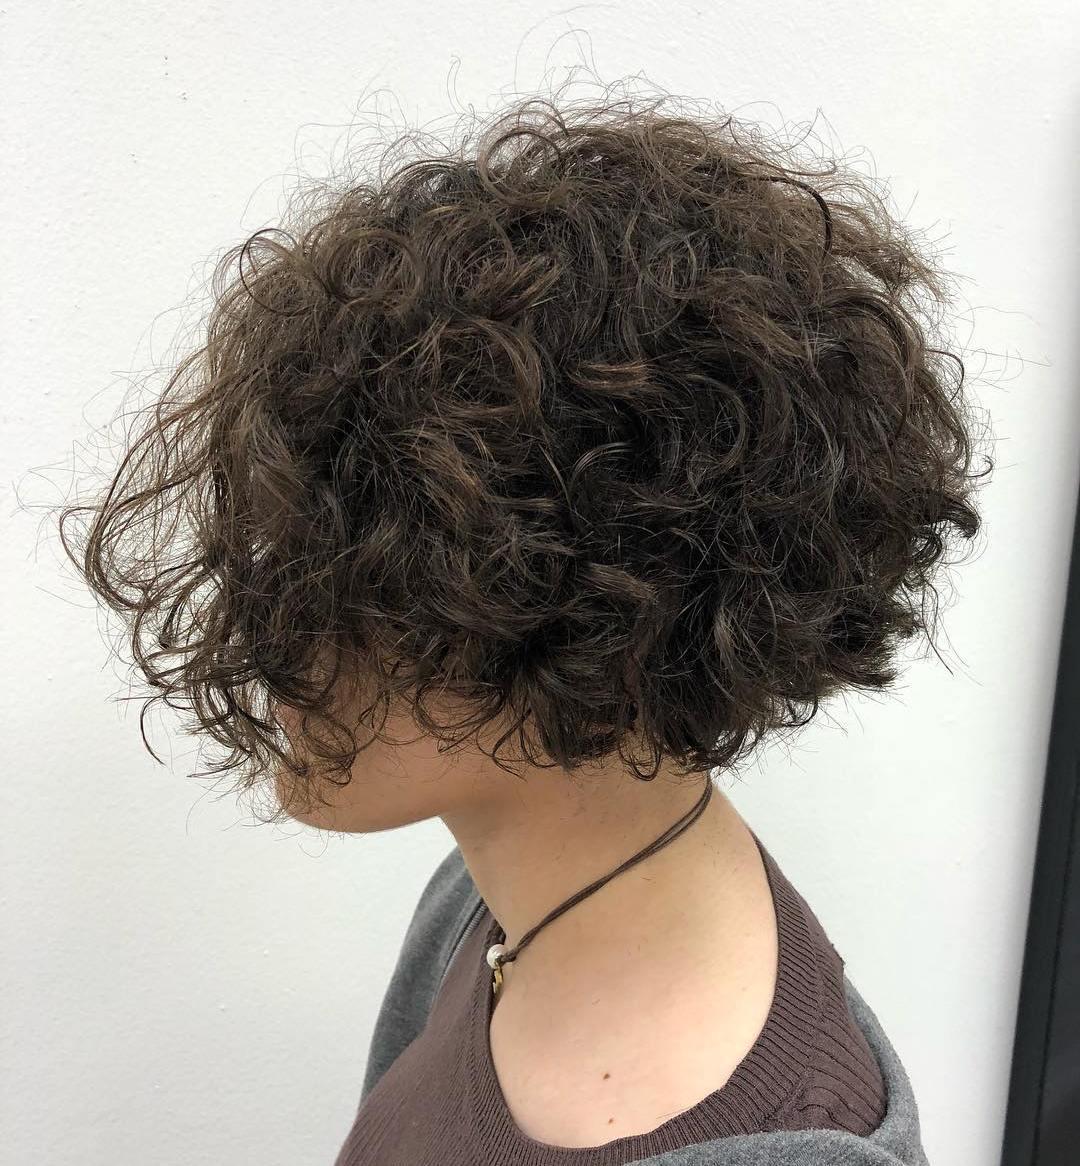 Short Bob for Thick Wavy Hair